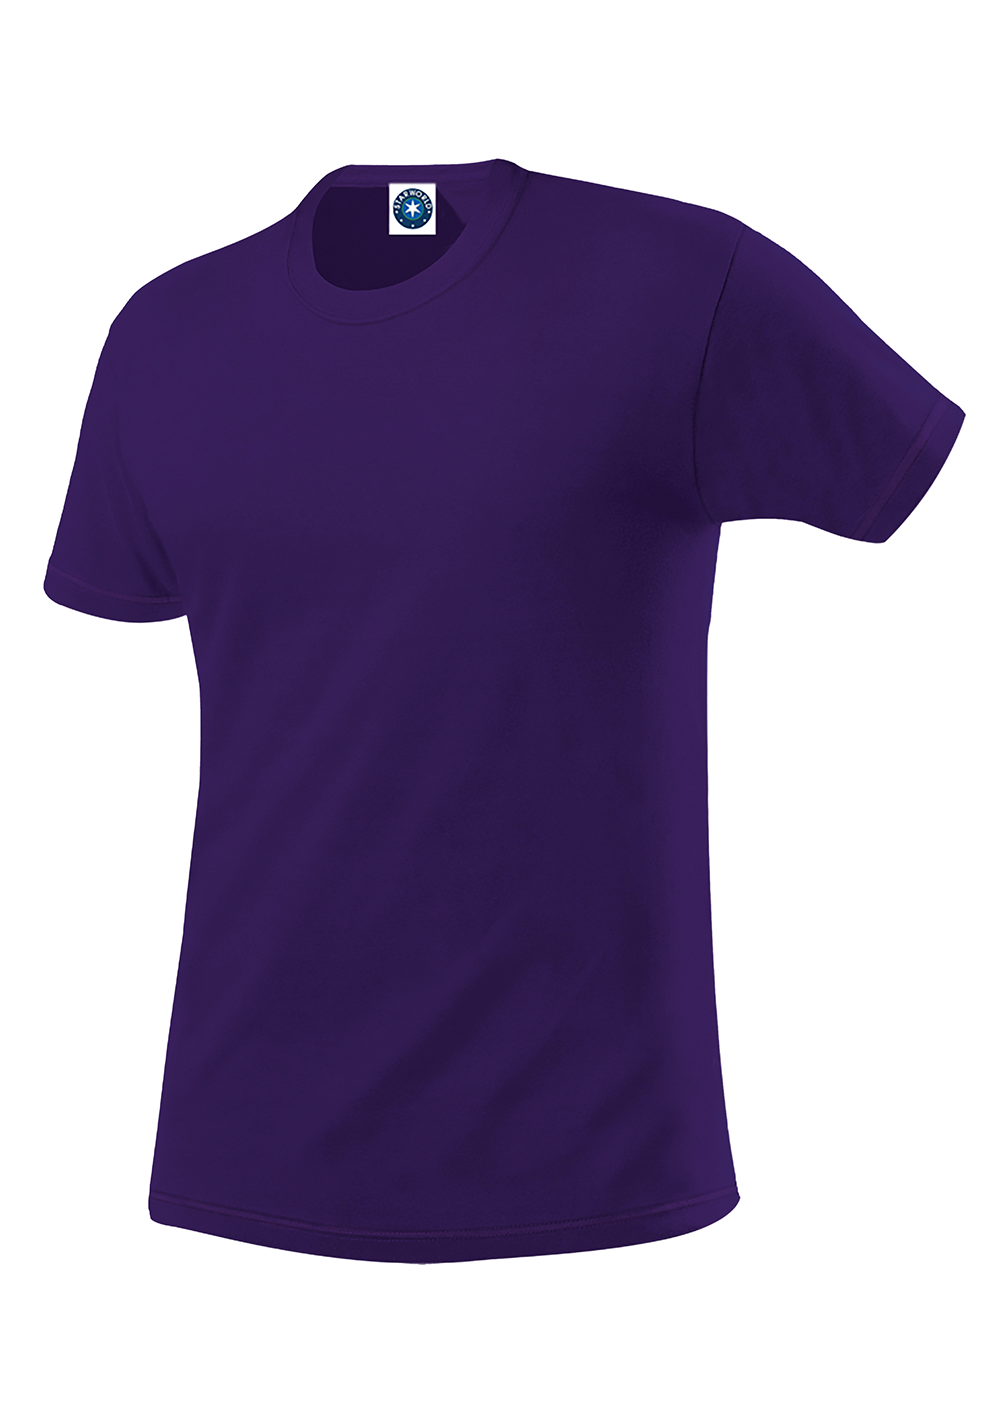 SWGL1-18-Purple.png